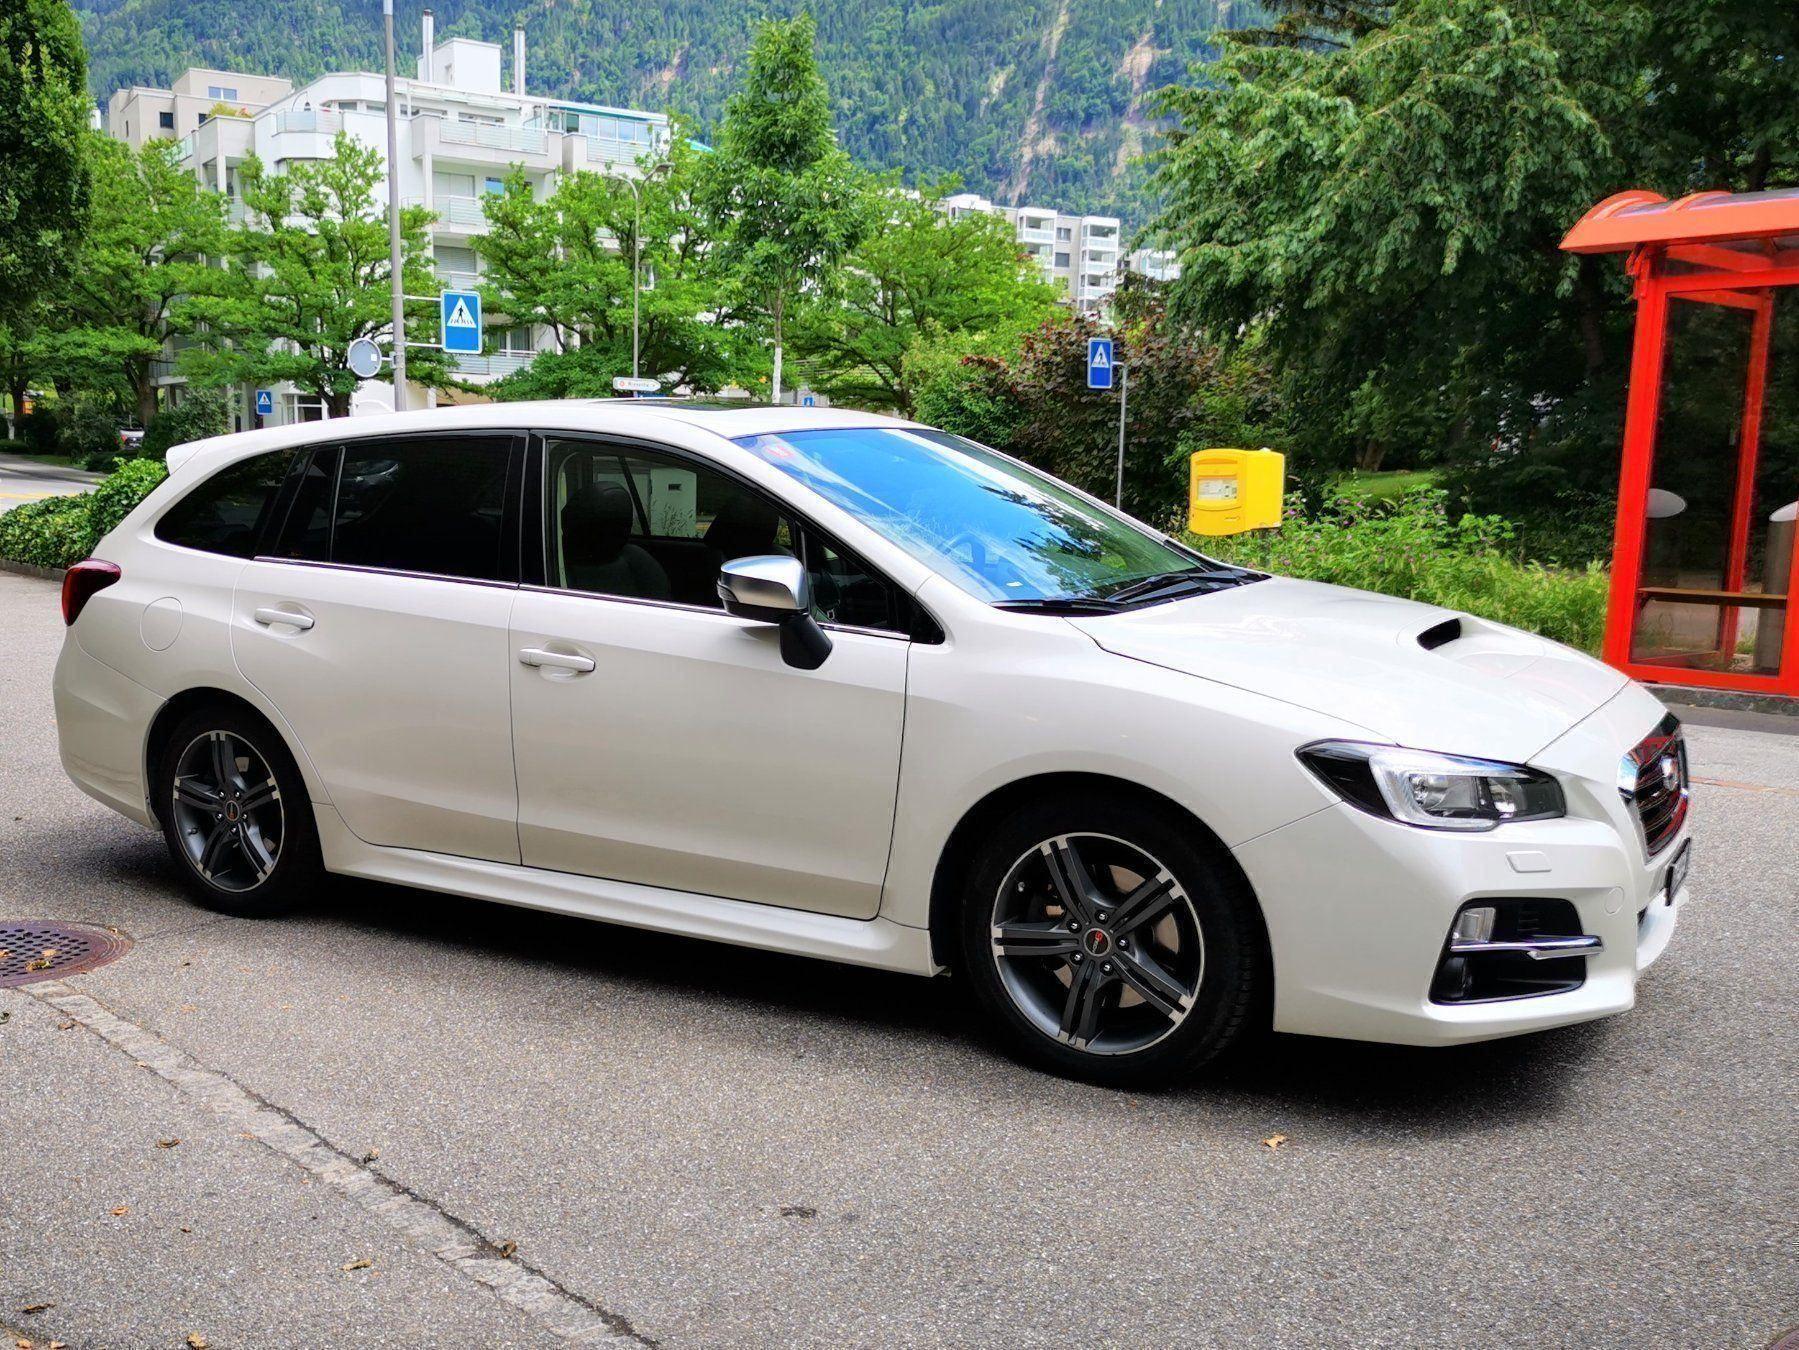 Subaru Levorg 1.6 DIT Luxury S